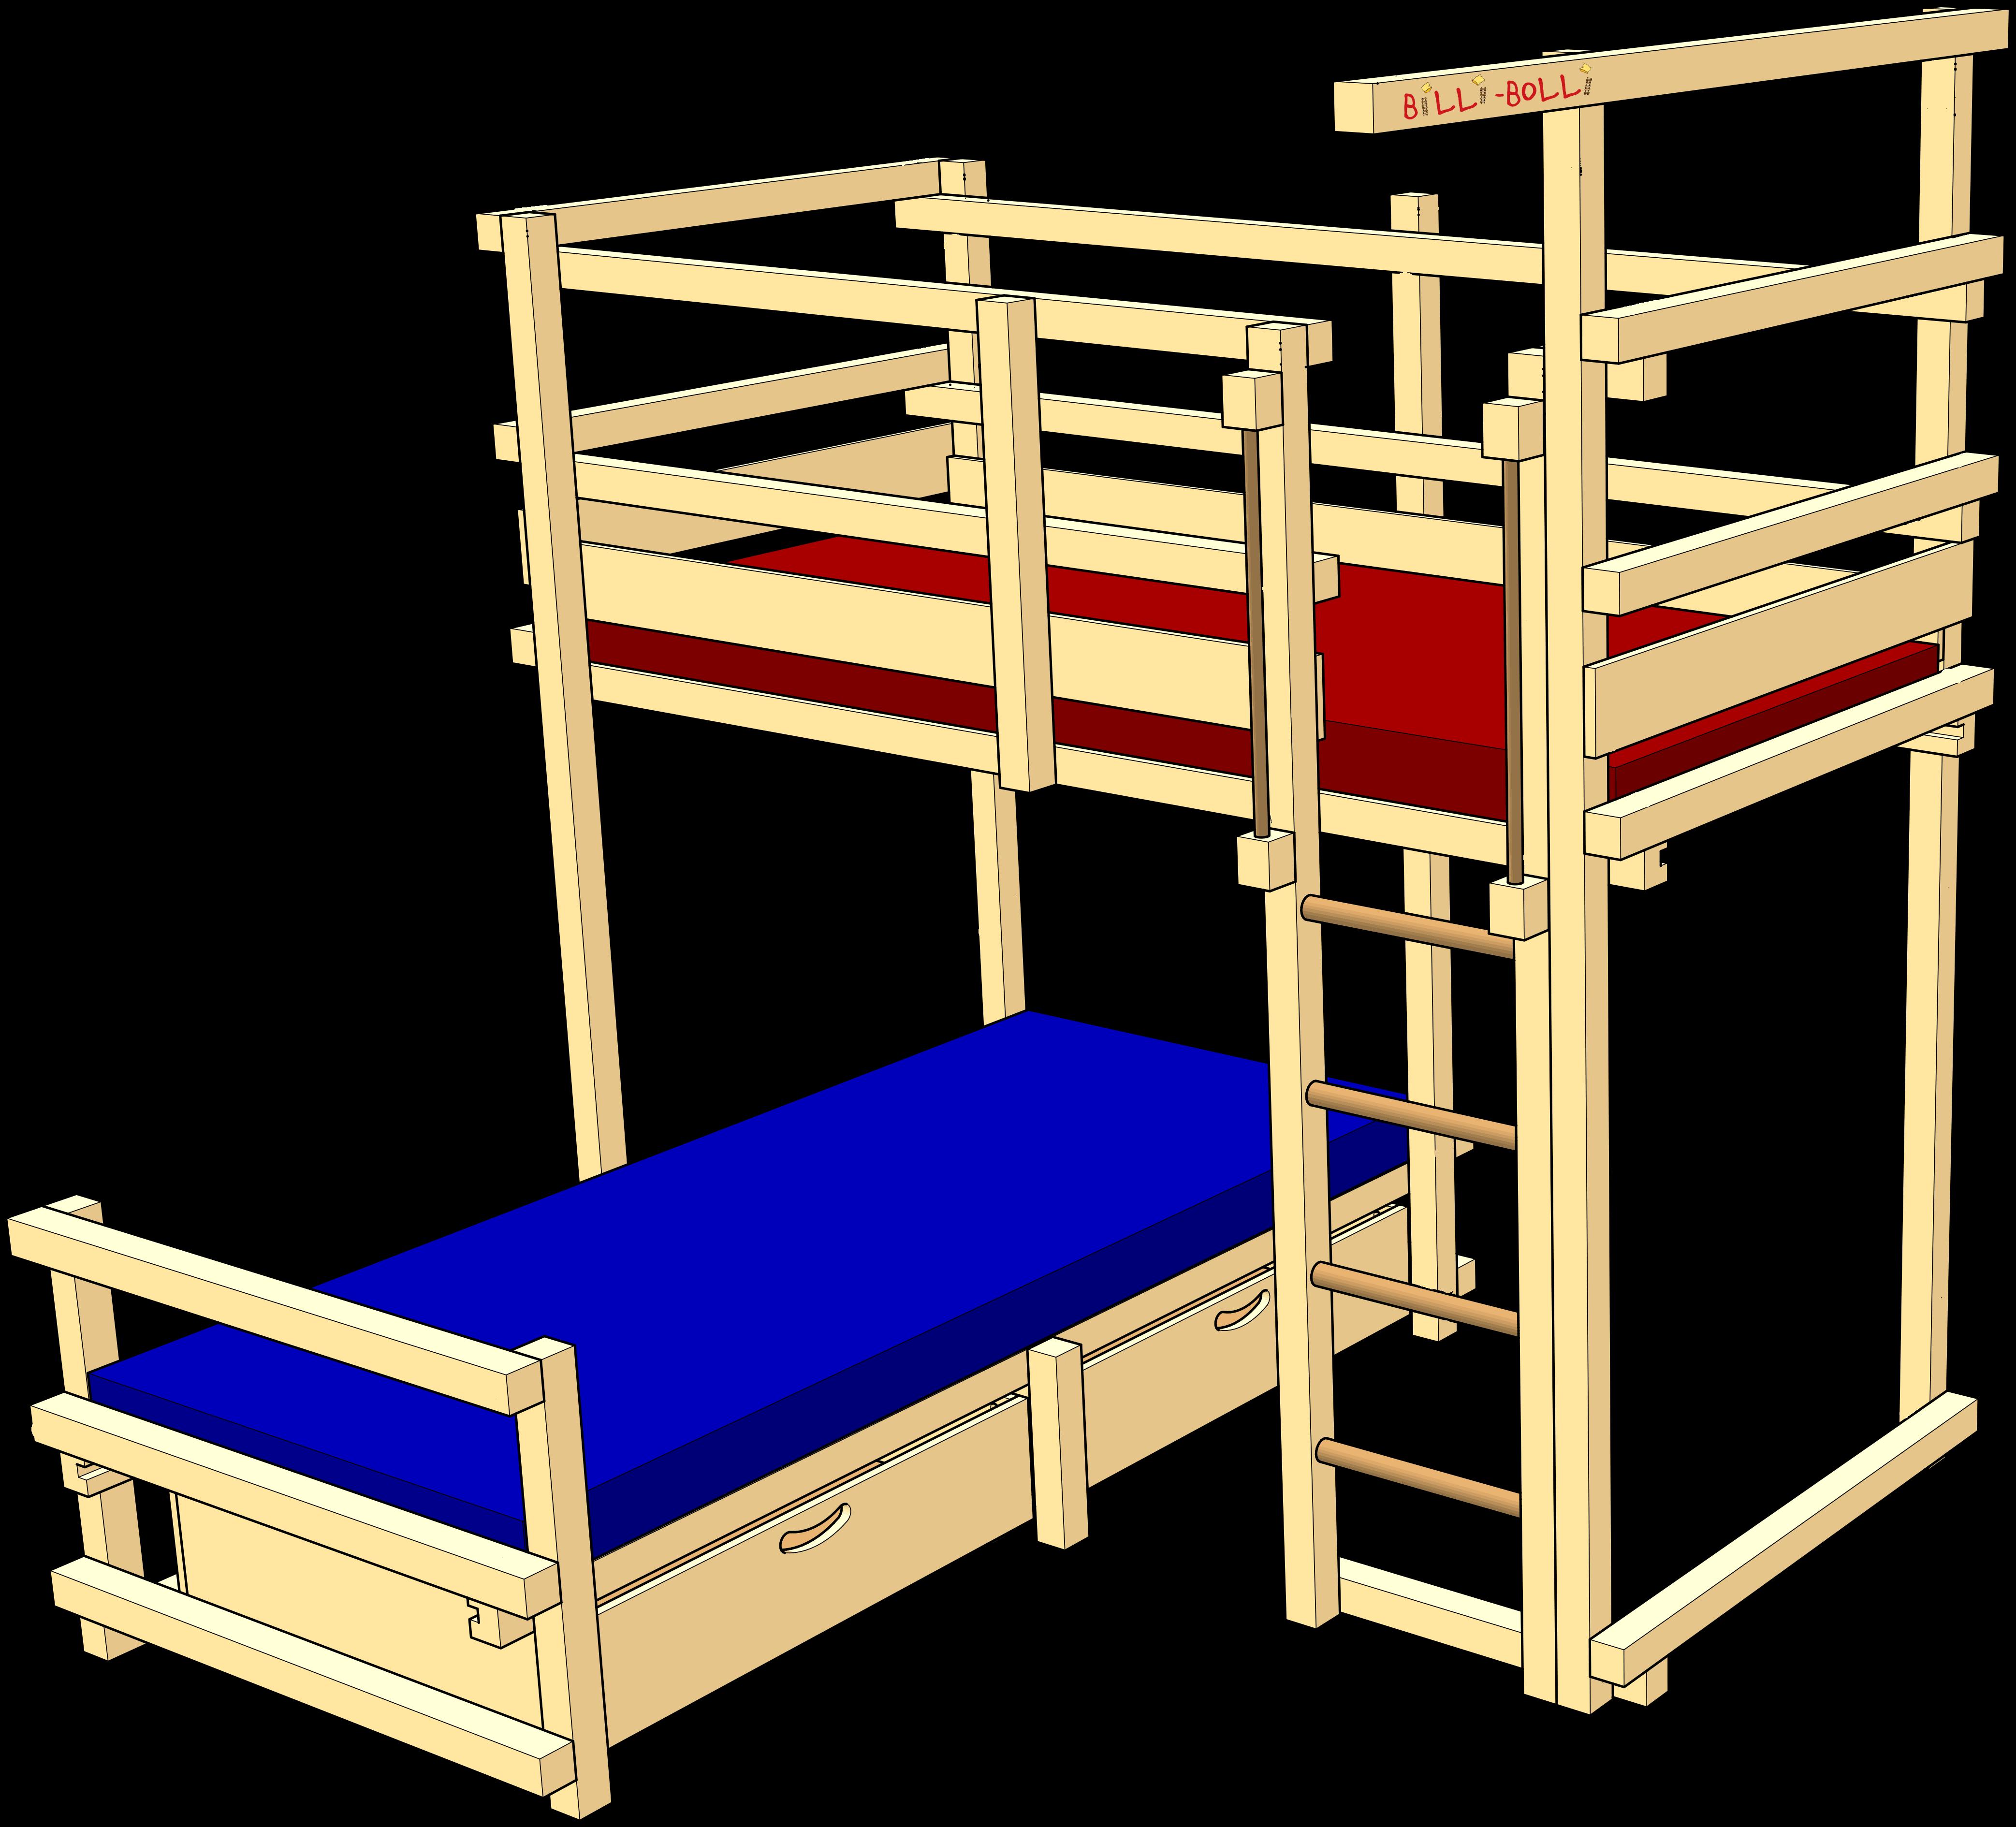 Corner Bunk Bed Buy Online Billi Bolli